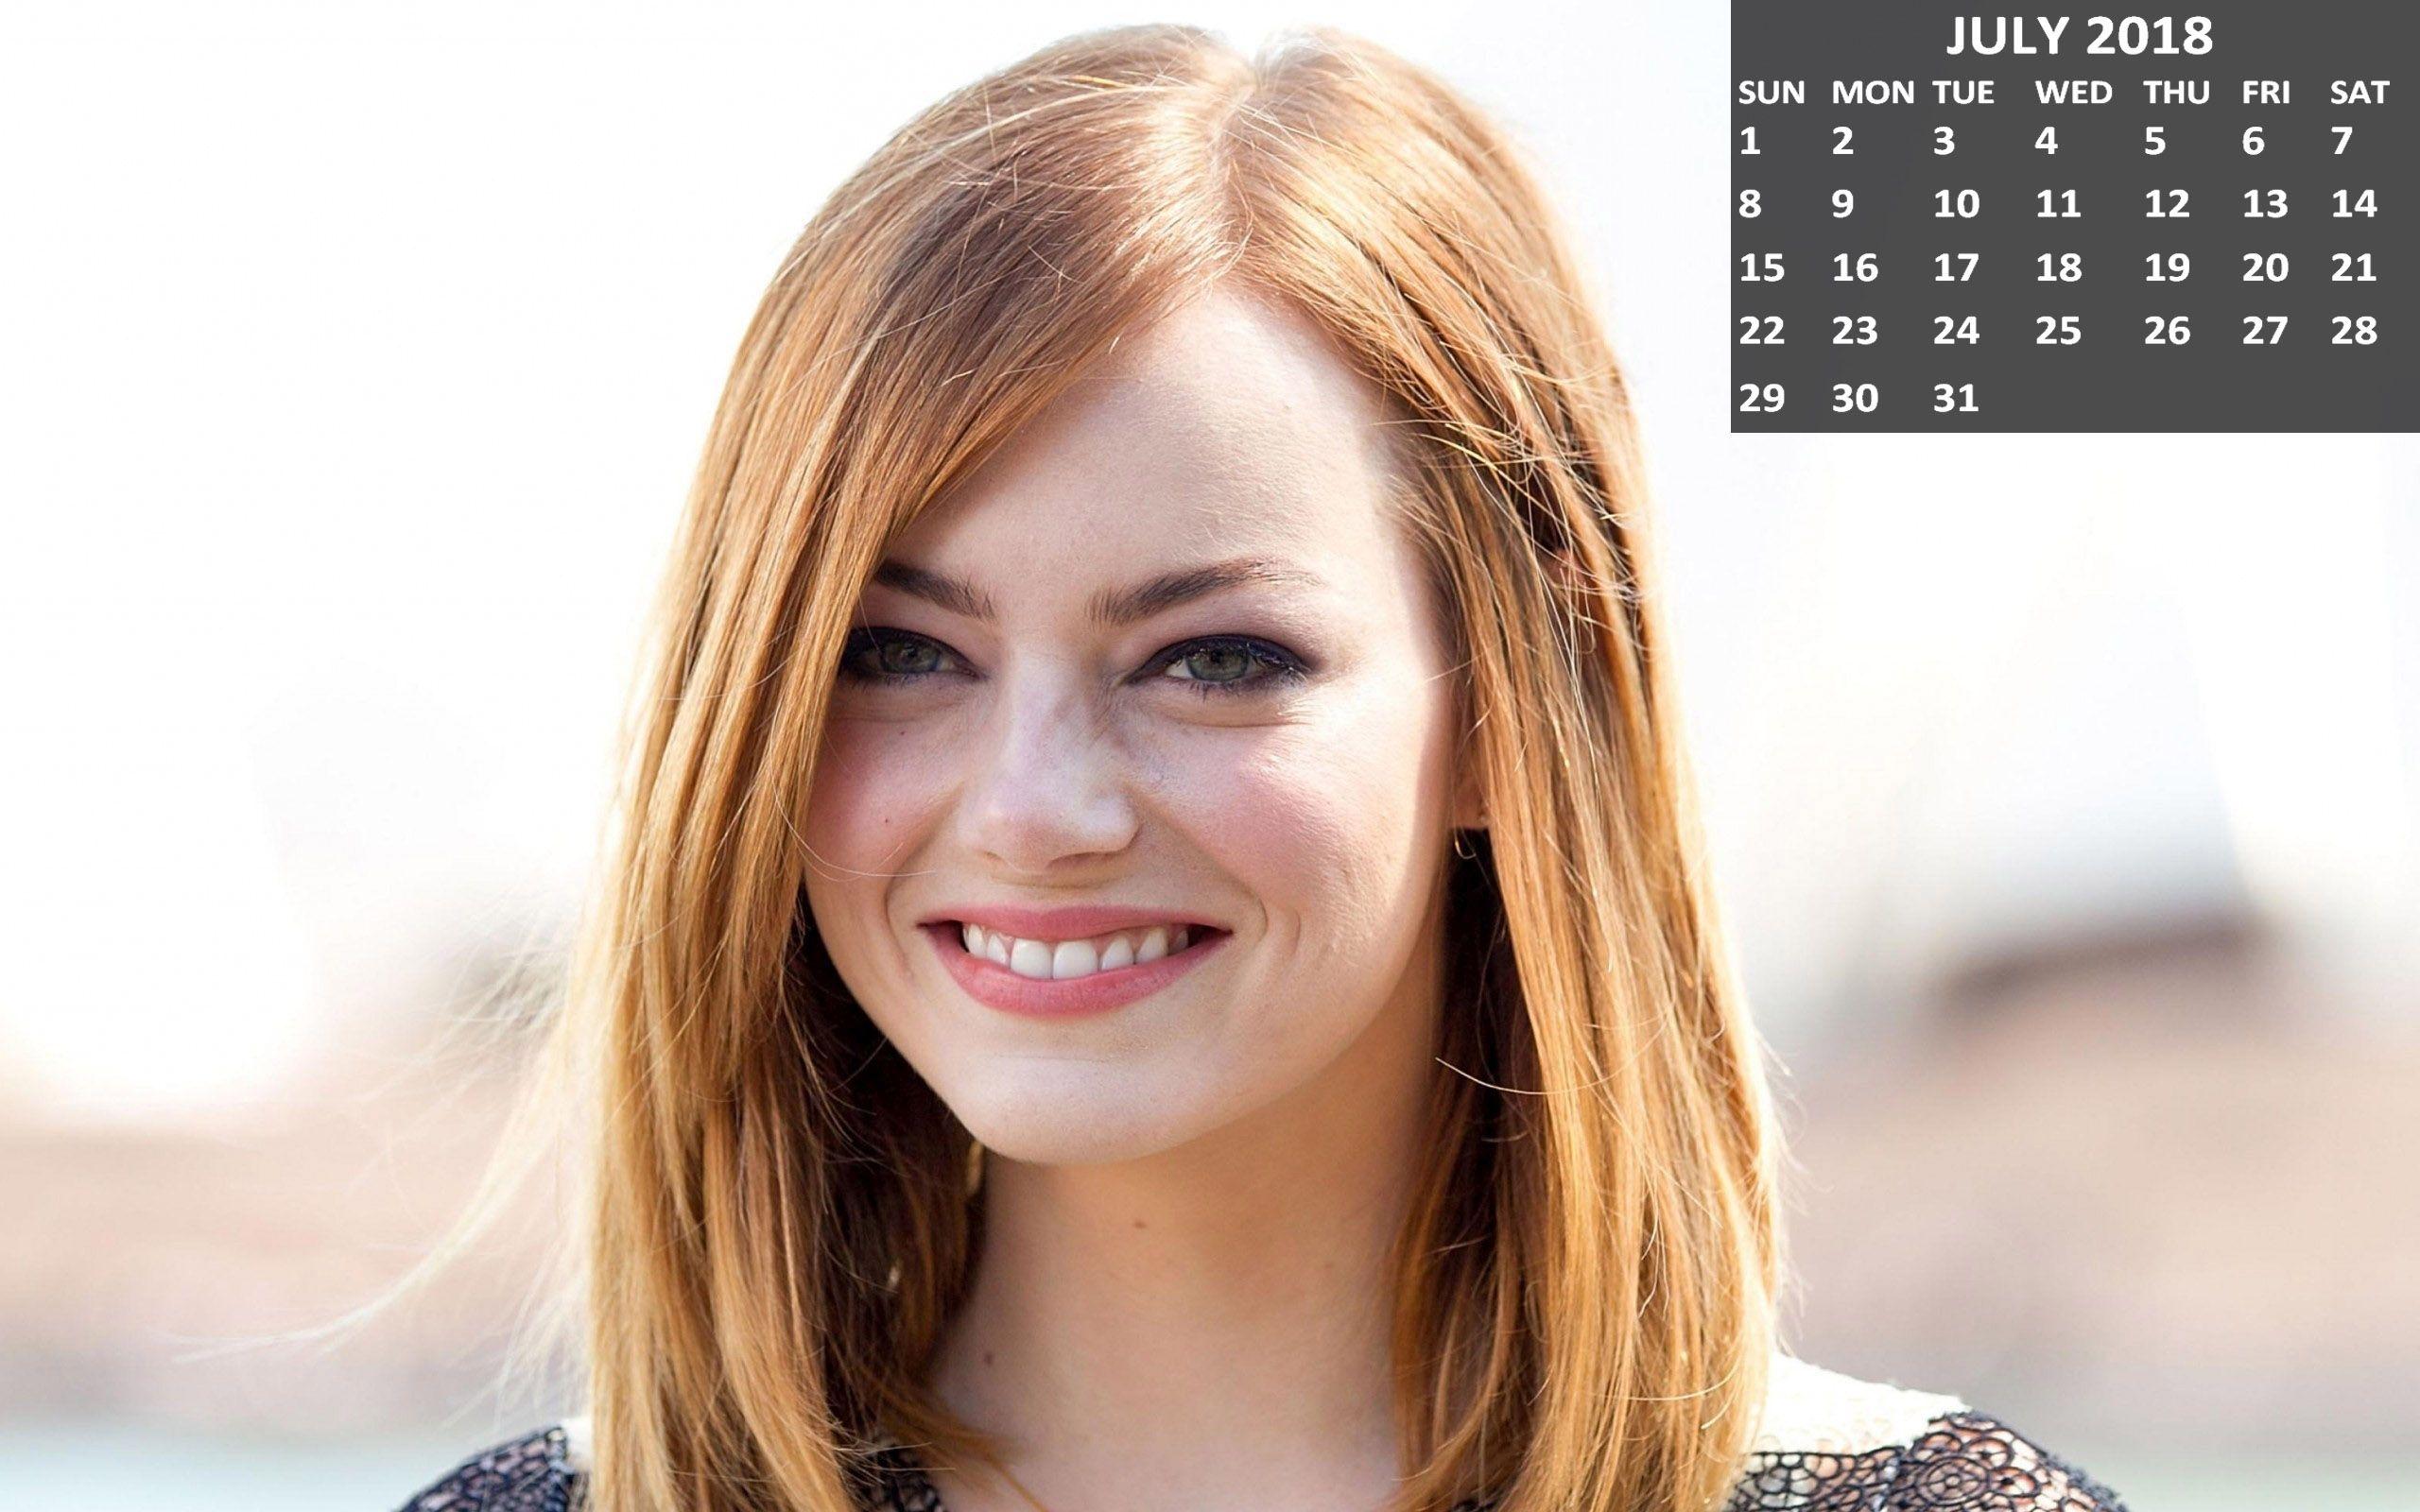 cute emma stone july 2018 calendar | 2018 calendars | pinterest